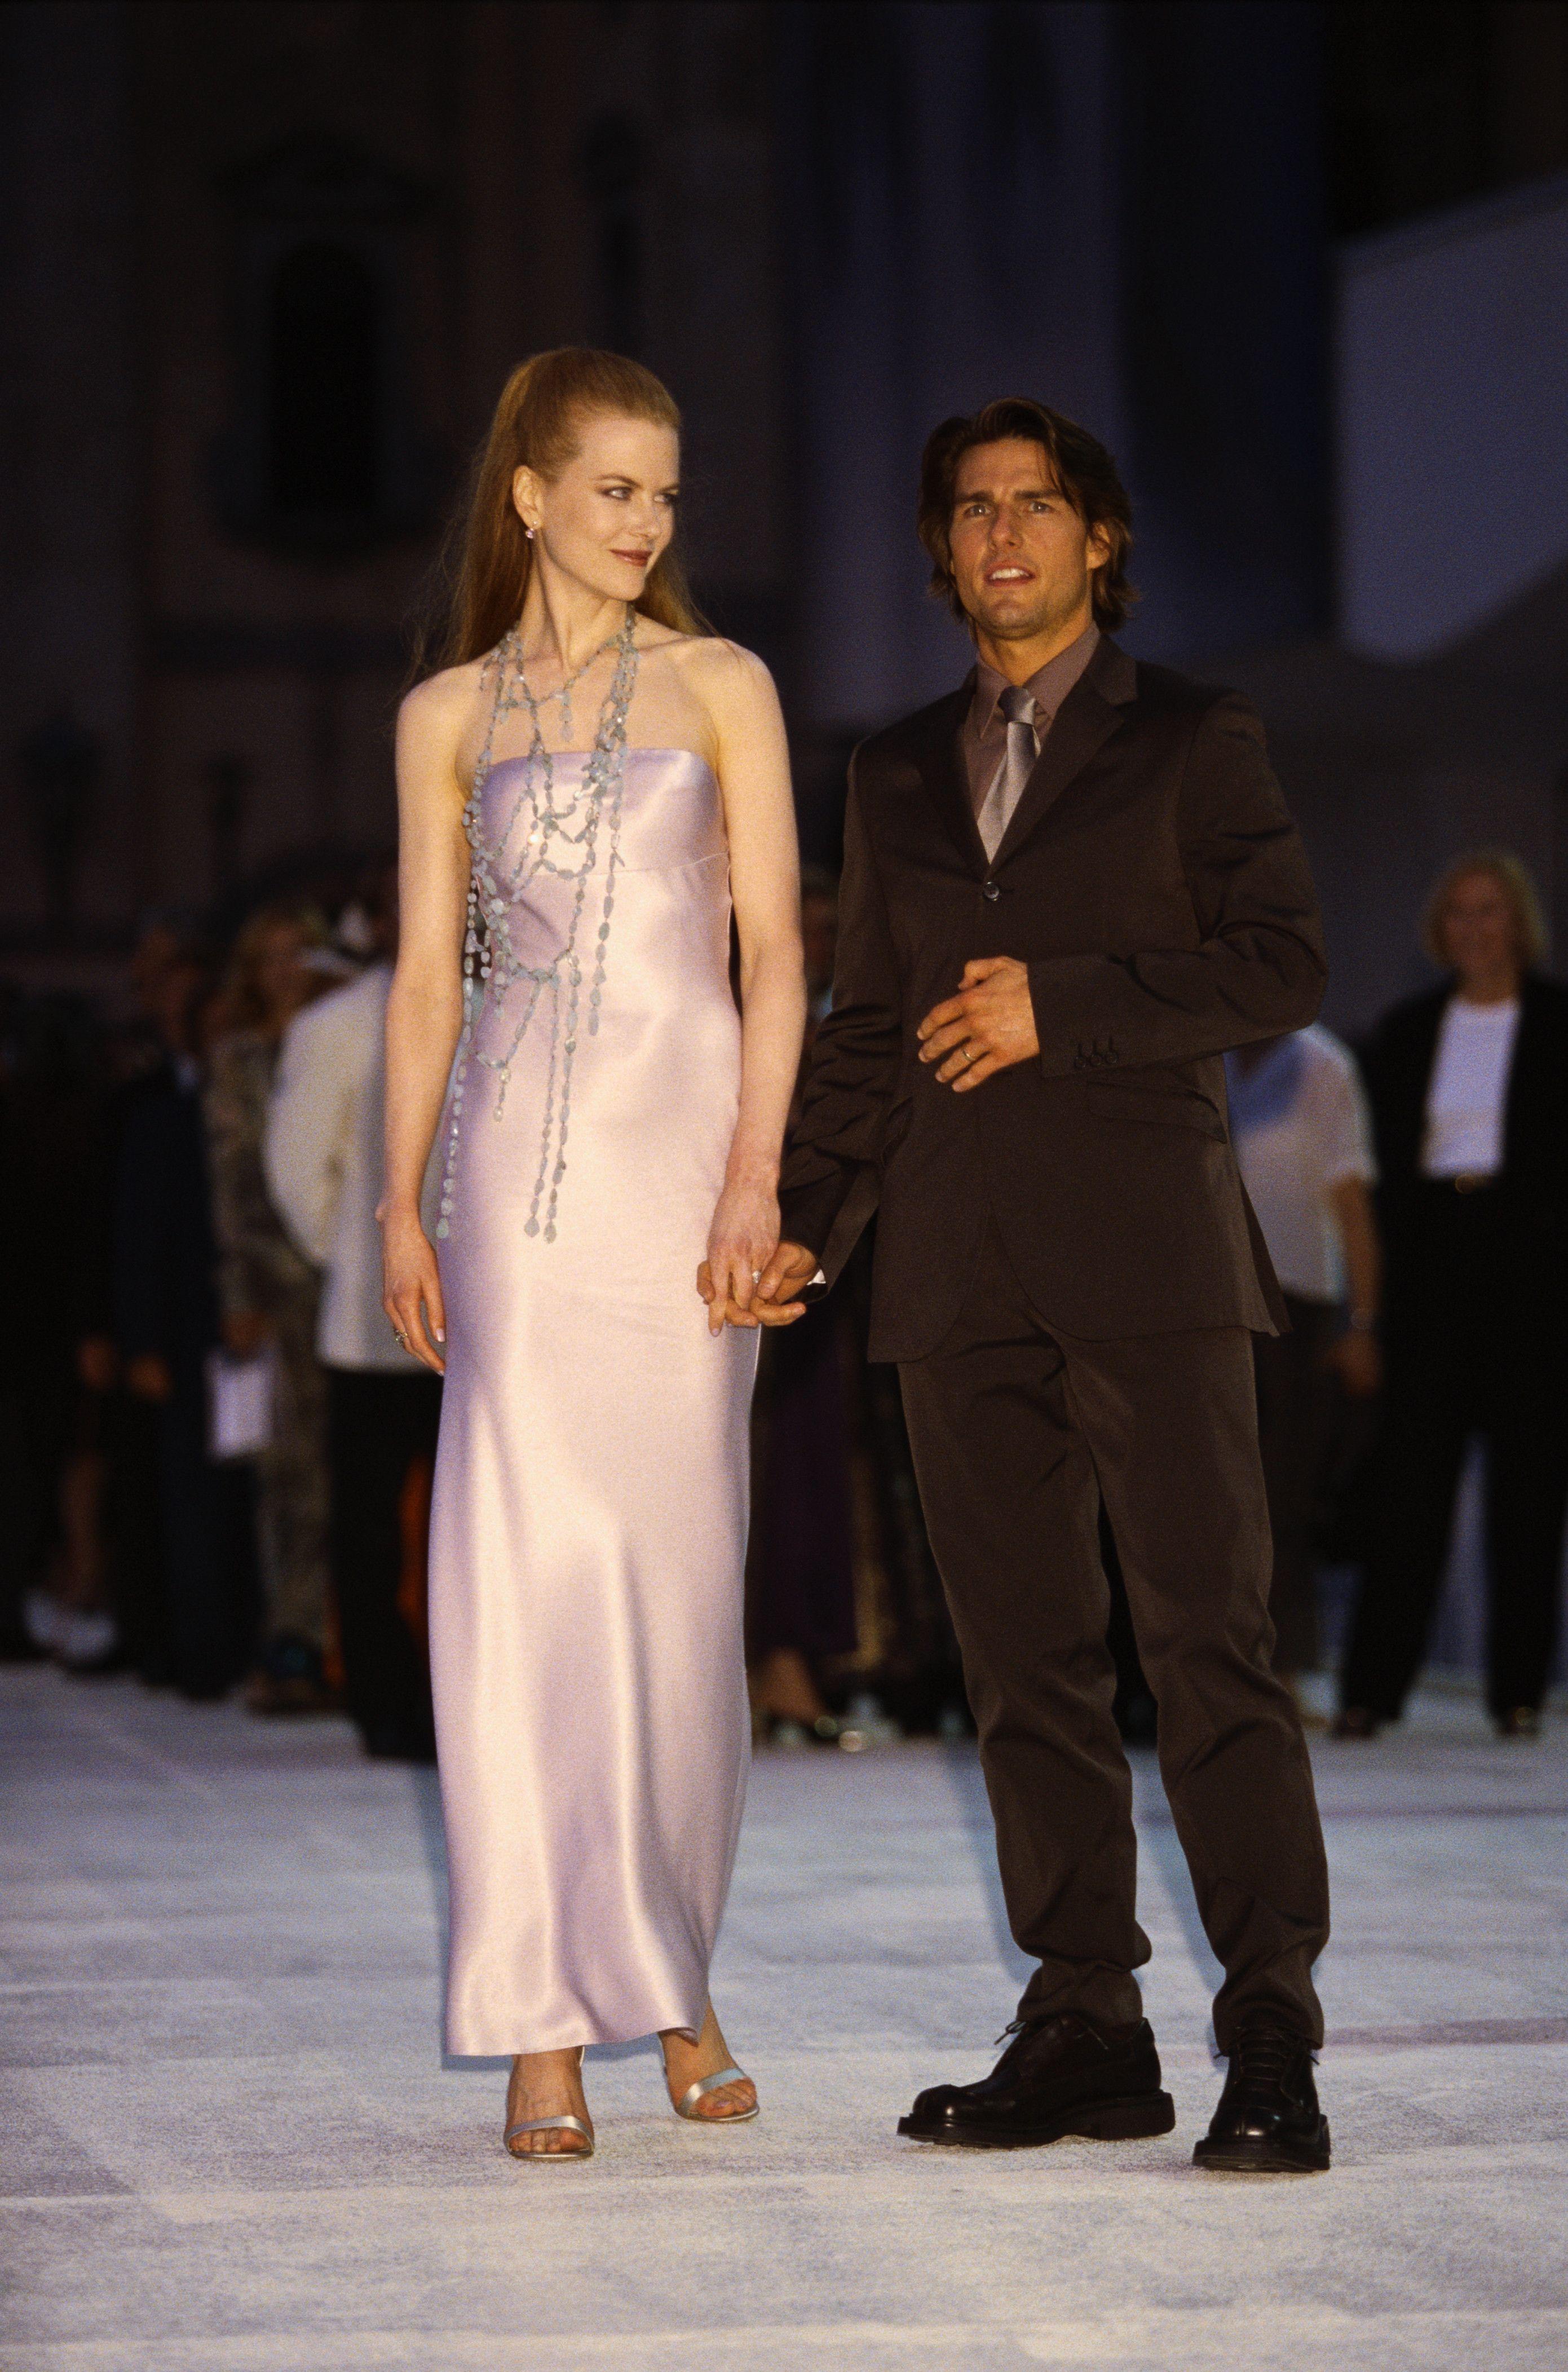 How Nicole Kidman Dressed In The '90s in 2020 | Nicole ...